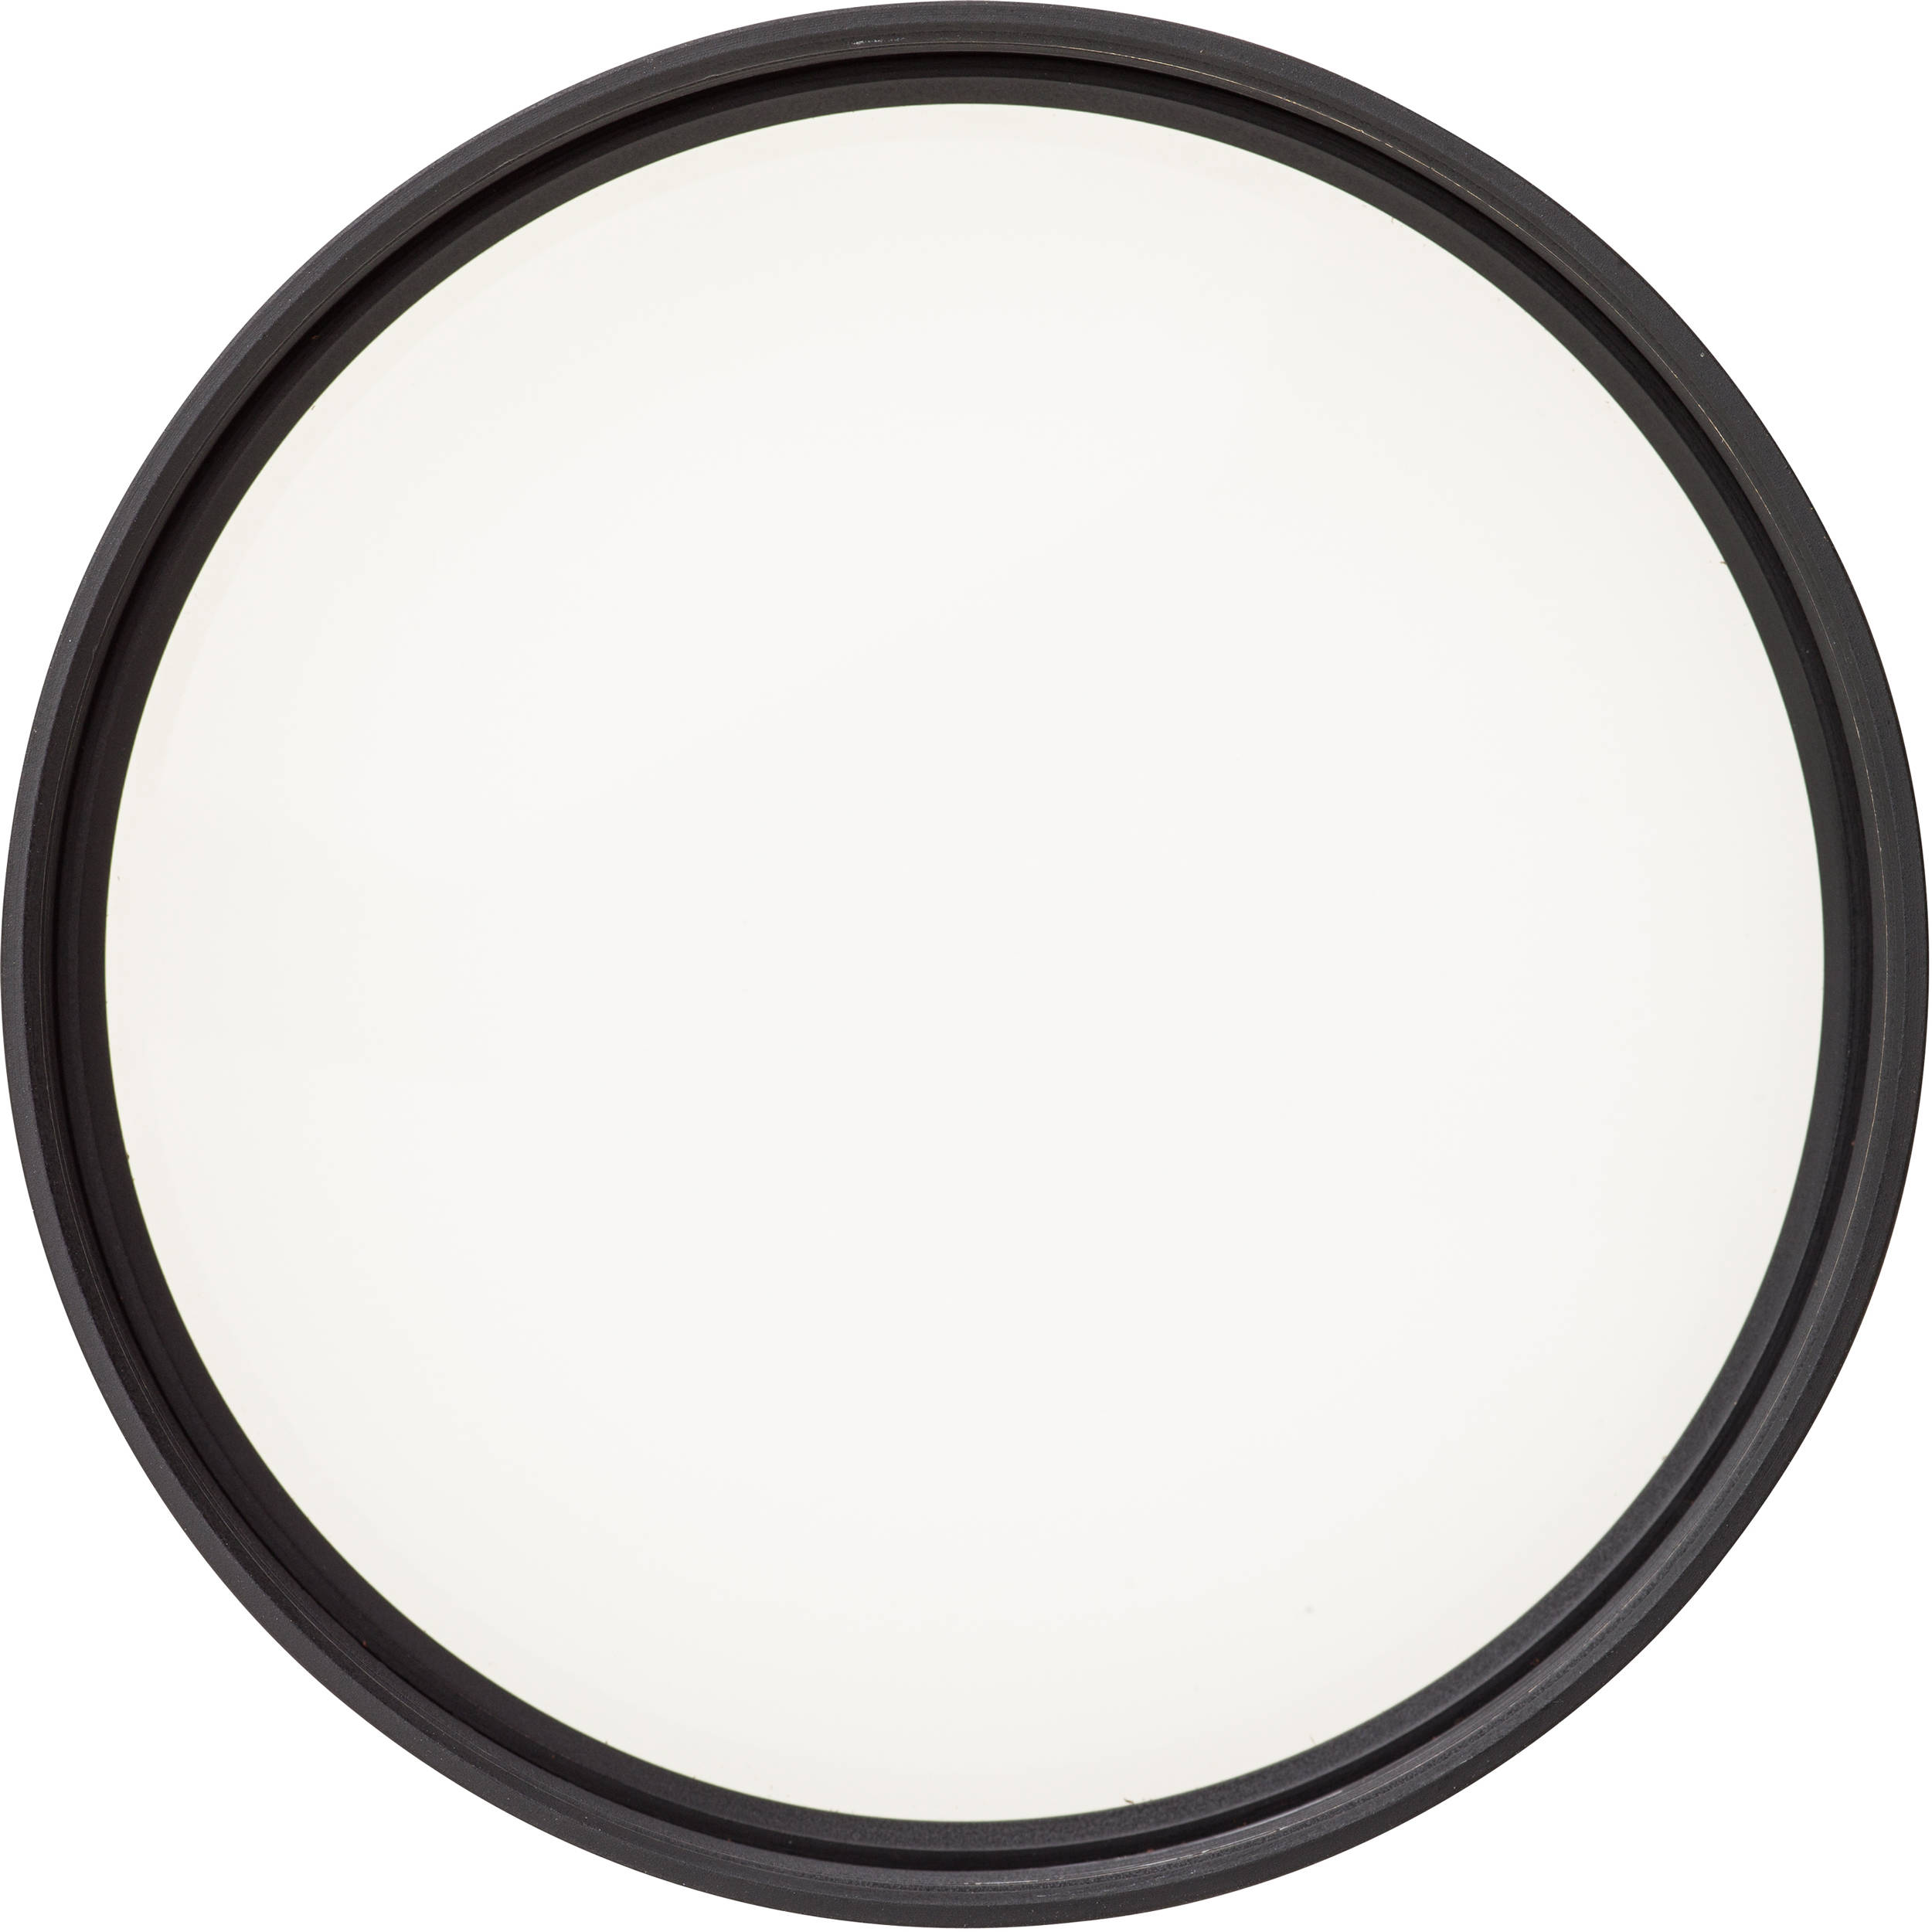 Heliopan 86mm Close Up 3 Filter 708629